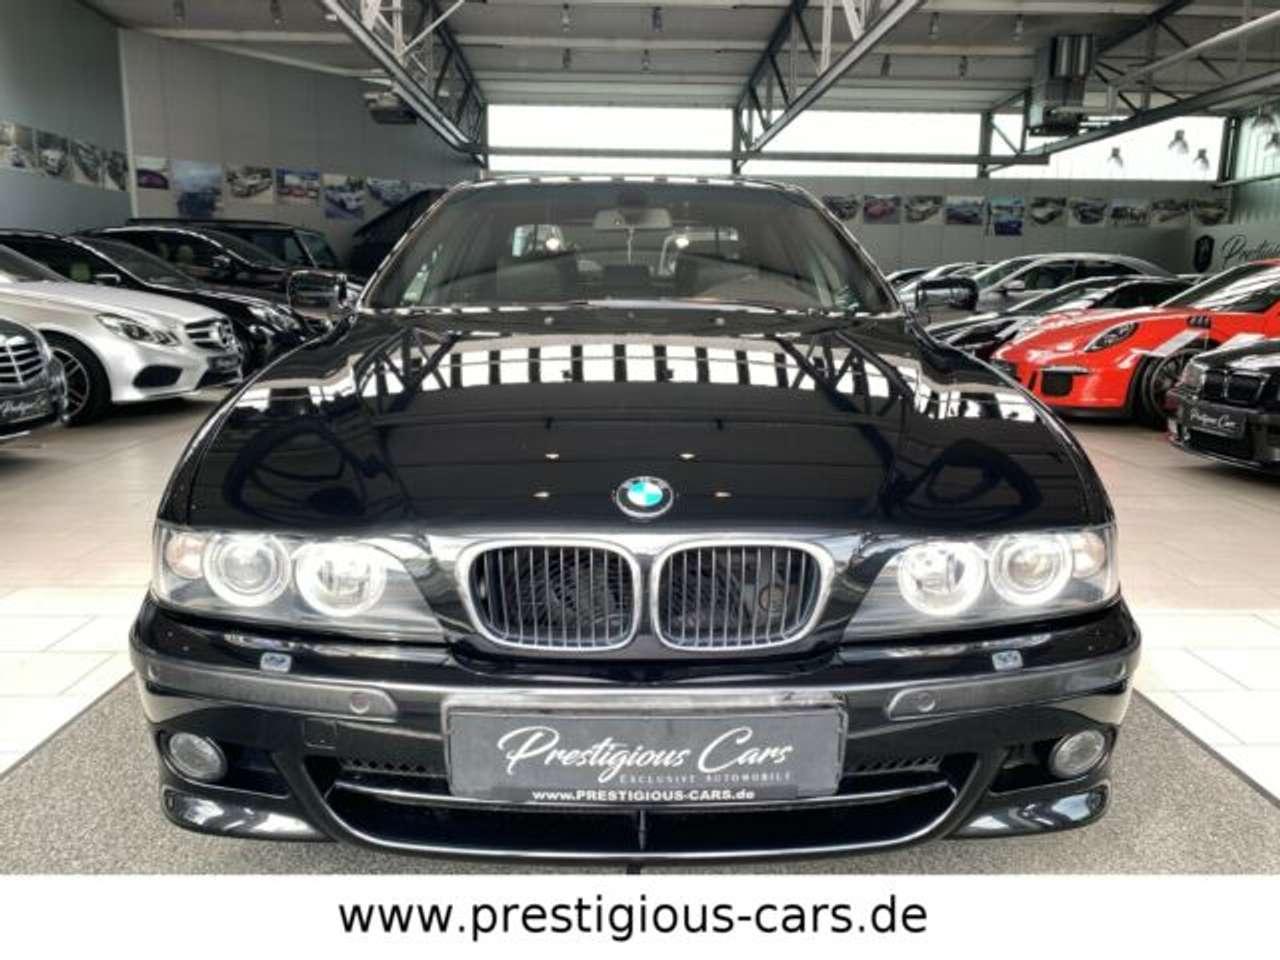 Autos nach BMW 5-Series 530d